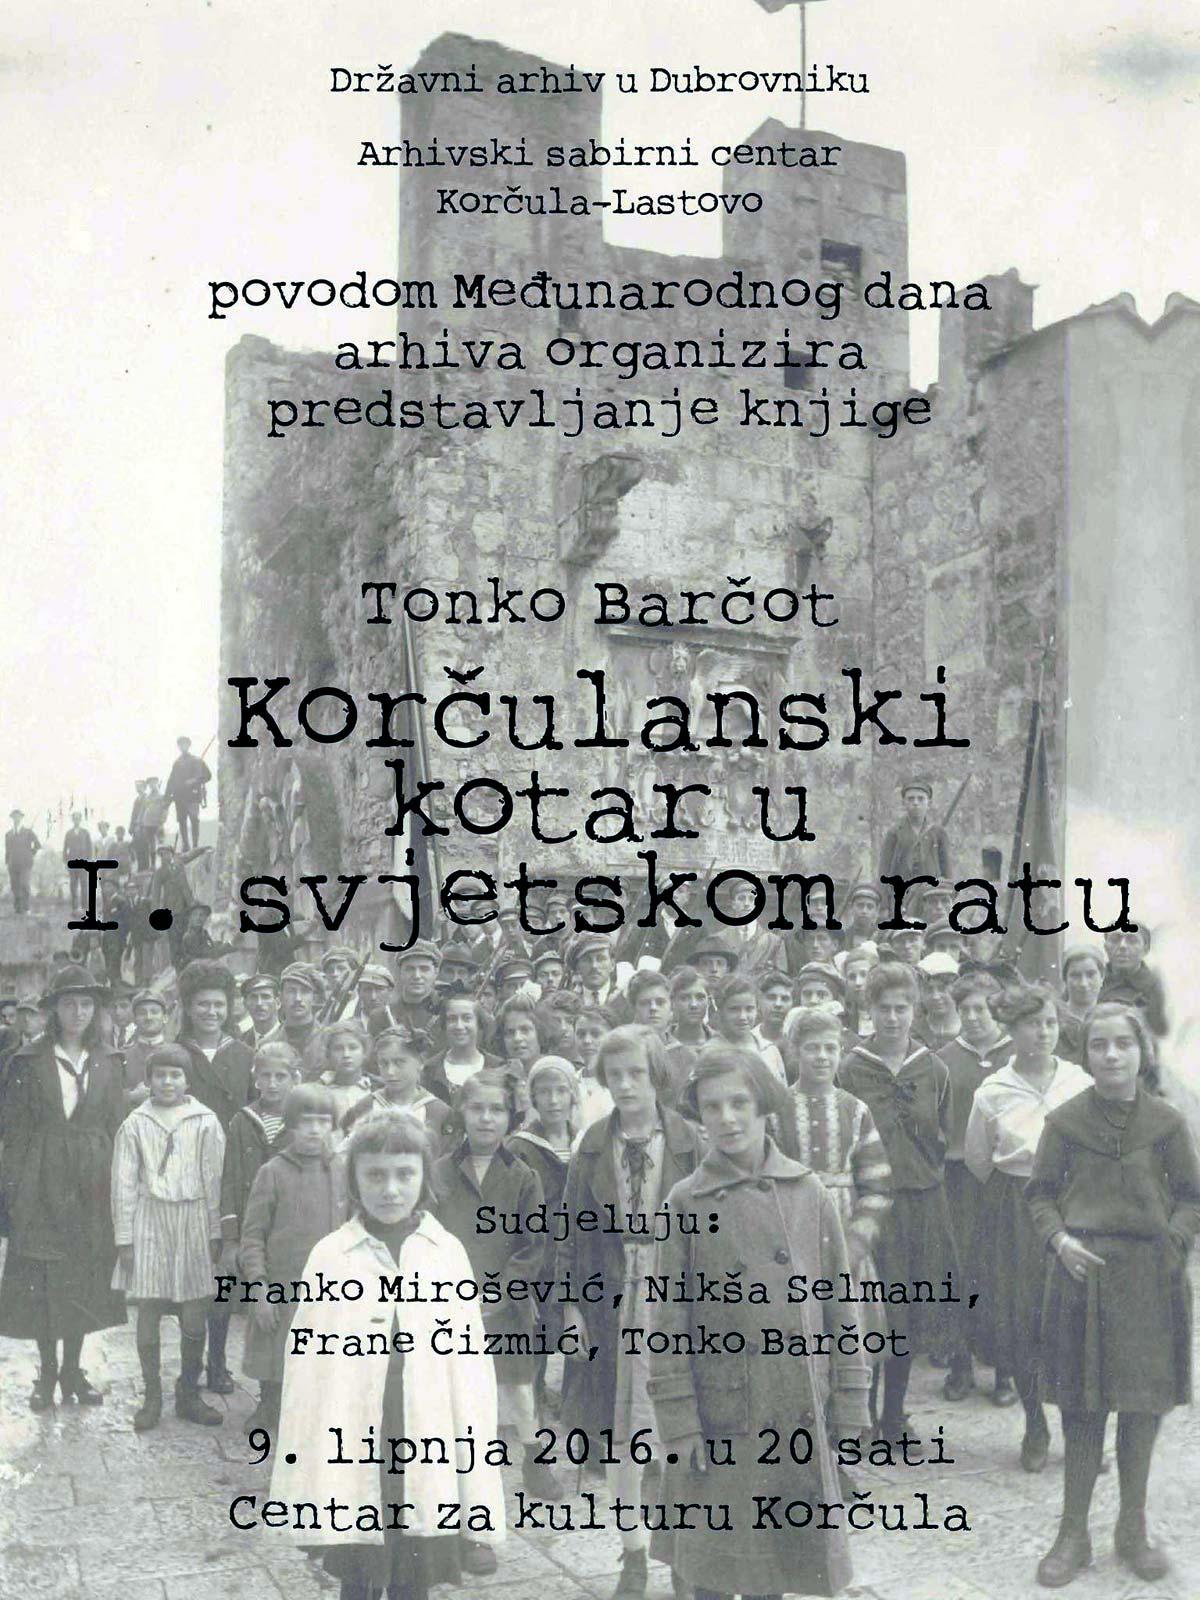 tonko-barcot-korculanski-kotar2016a